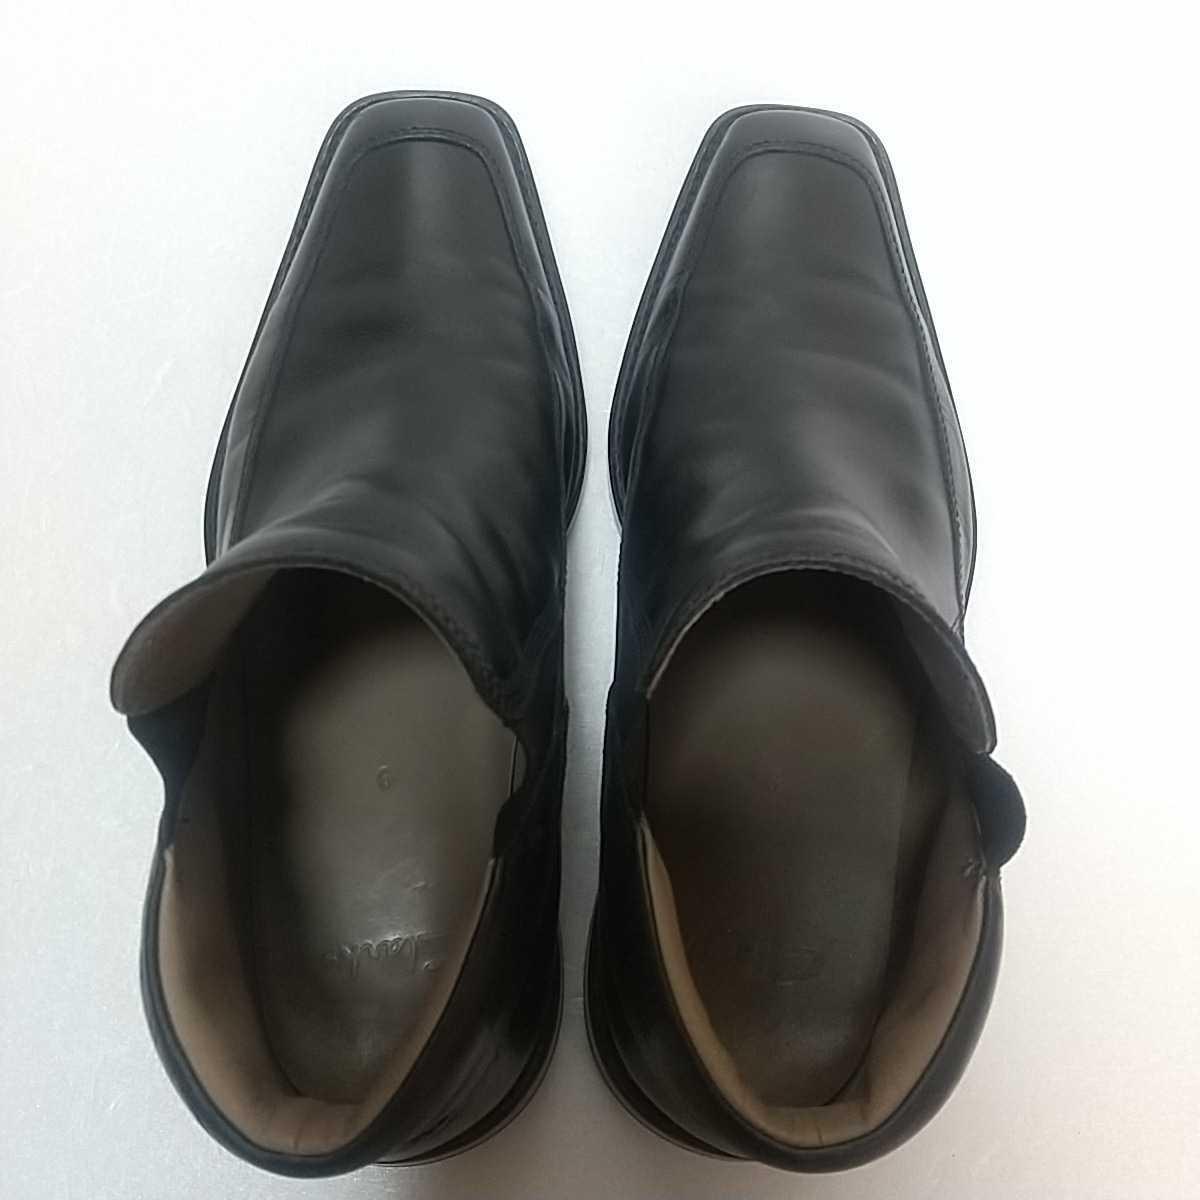 Clarks クラークス レザー サイドゴアブーツ ショート UK9 27.5cm 黒 ブラック 革靴 _画像5